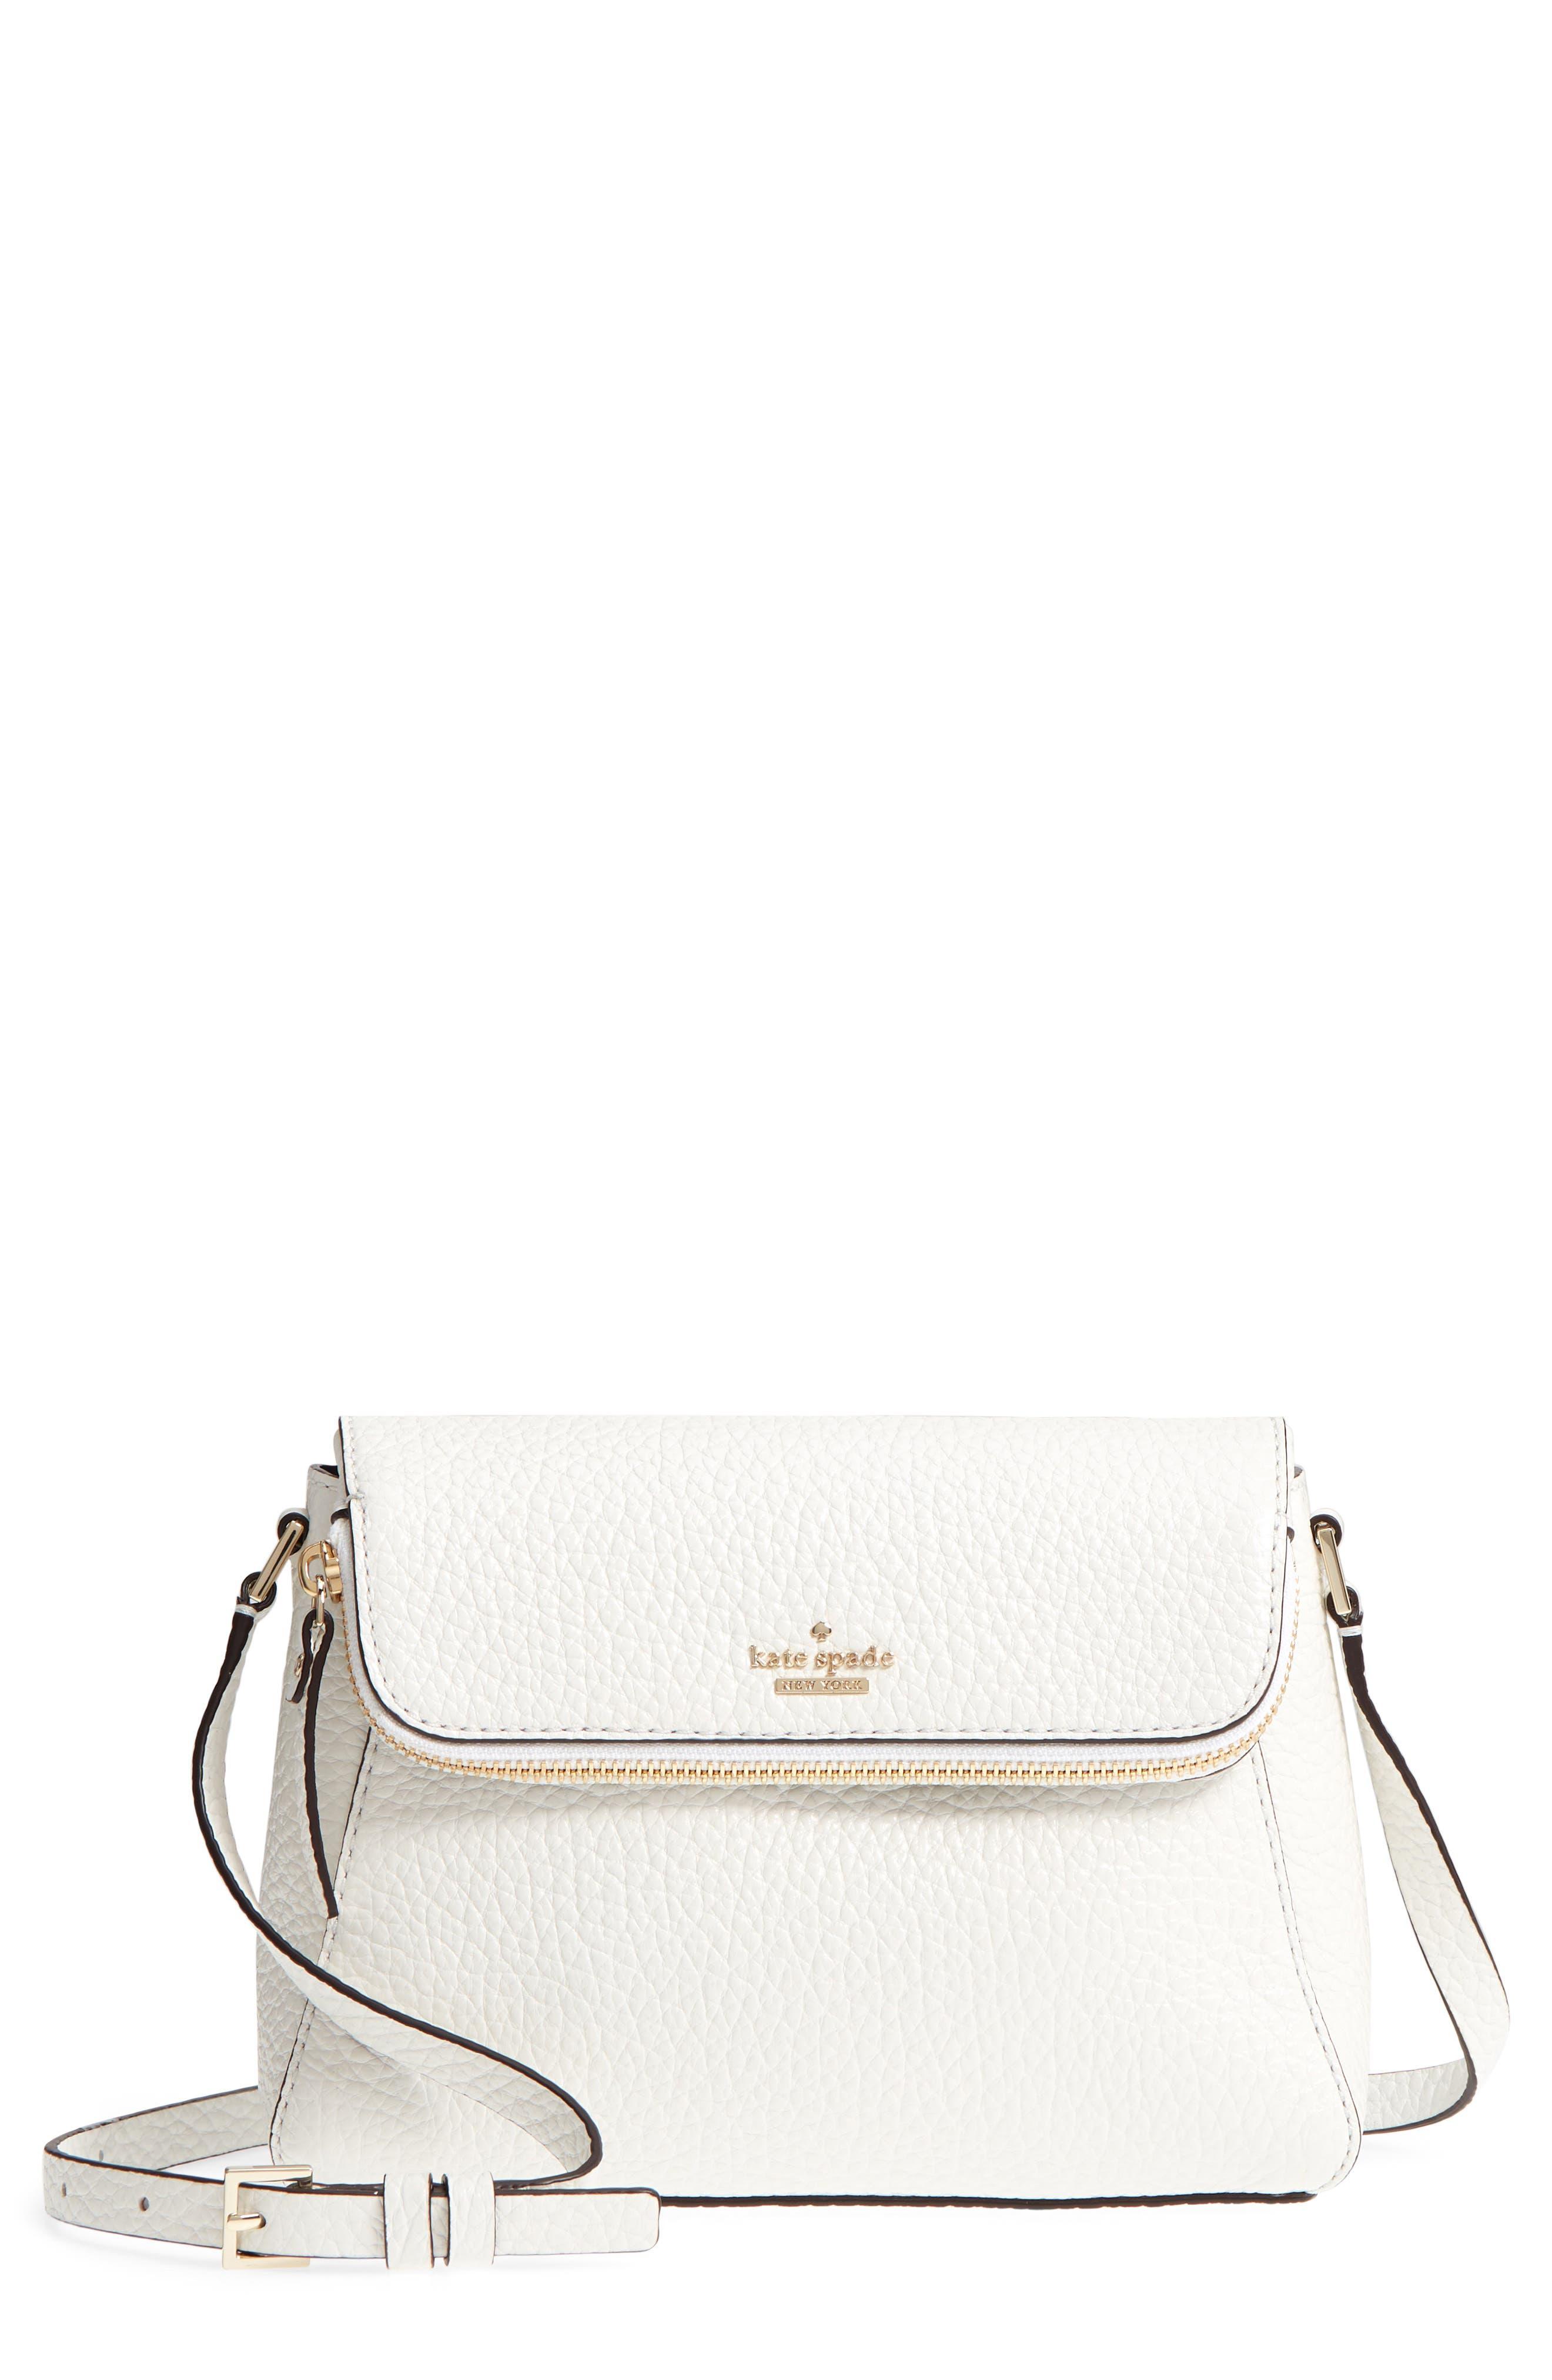 carter street - berrin leather crossbody bag,                         Main,                         color, Bright White